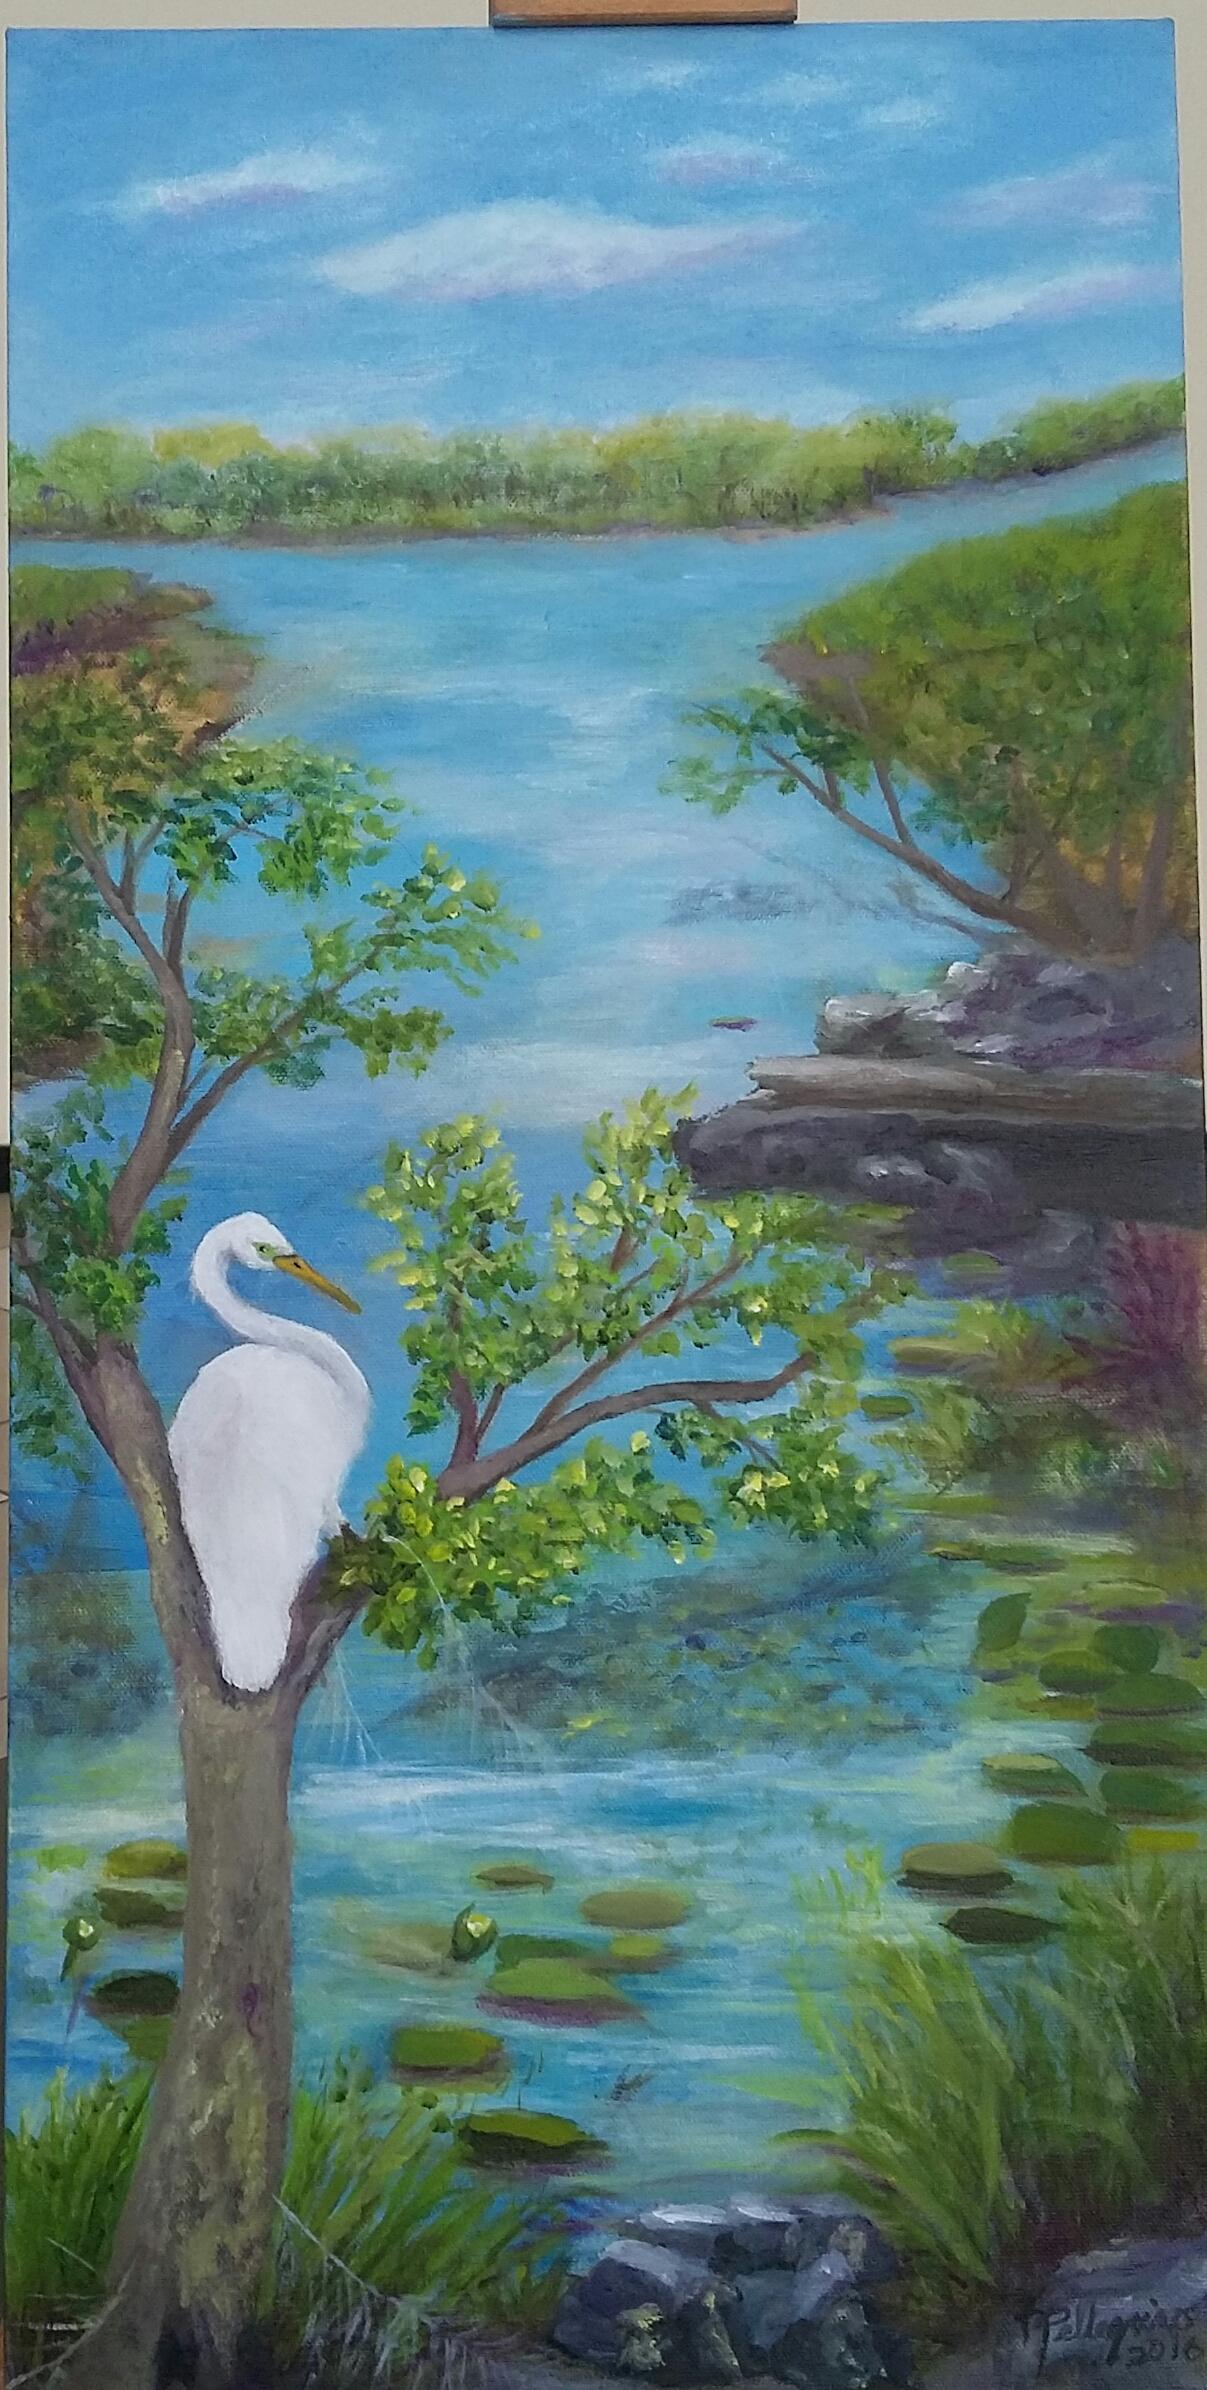 Looking Back, One Big Egret